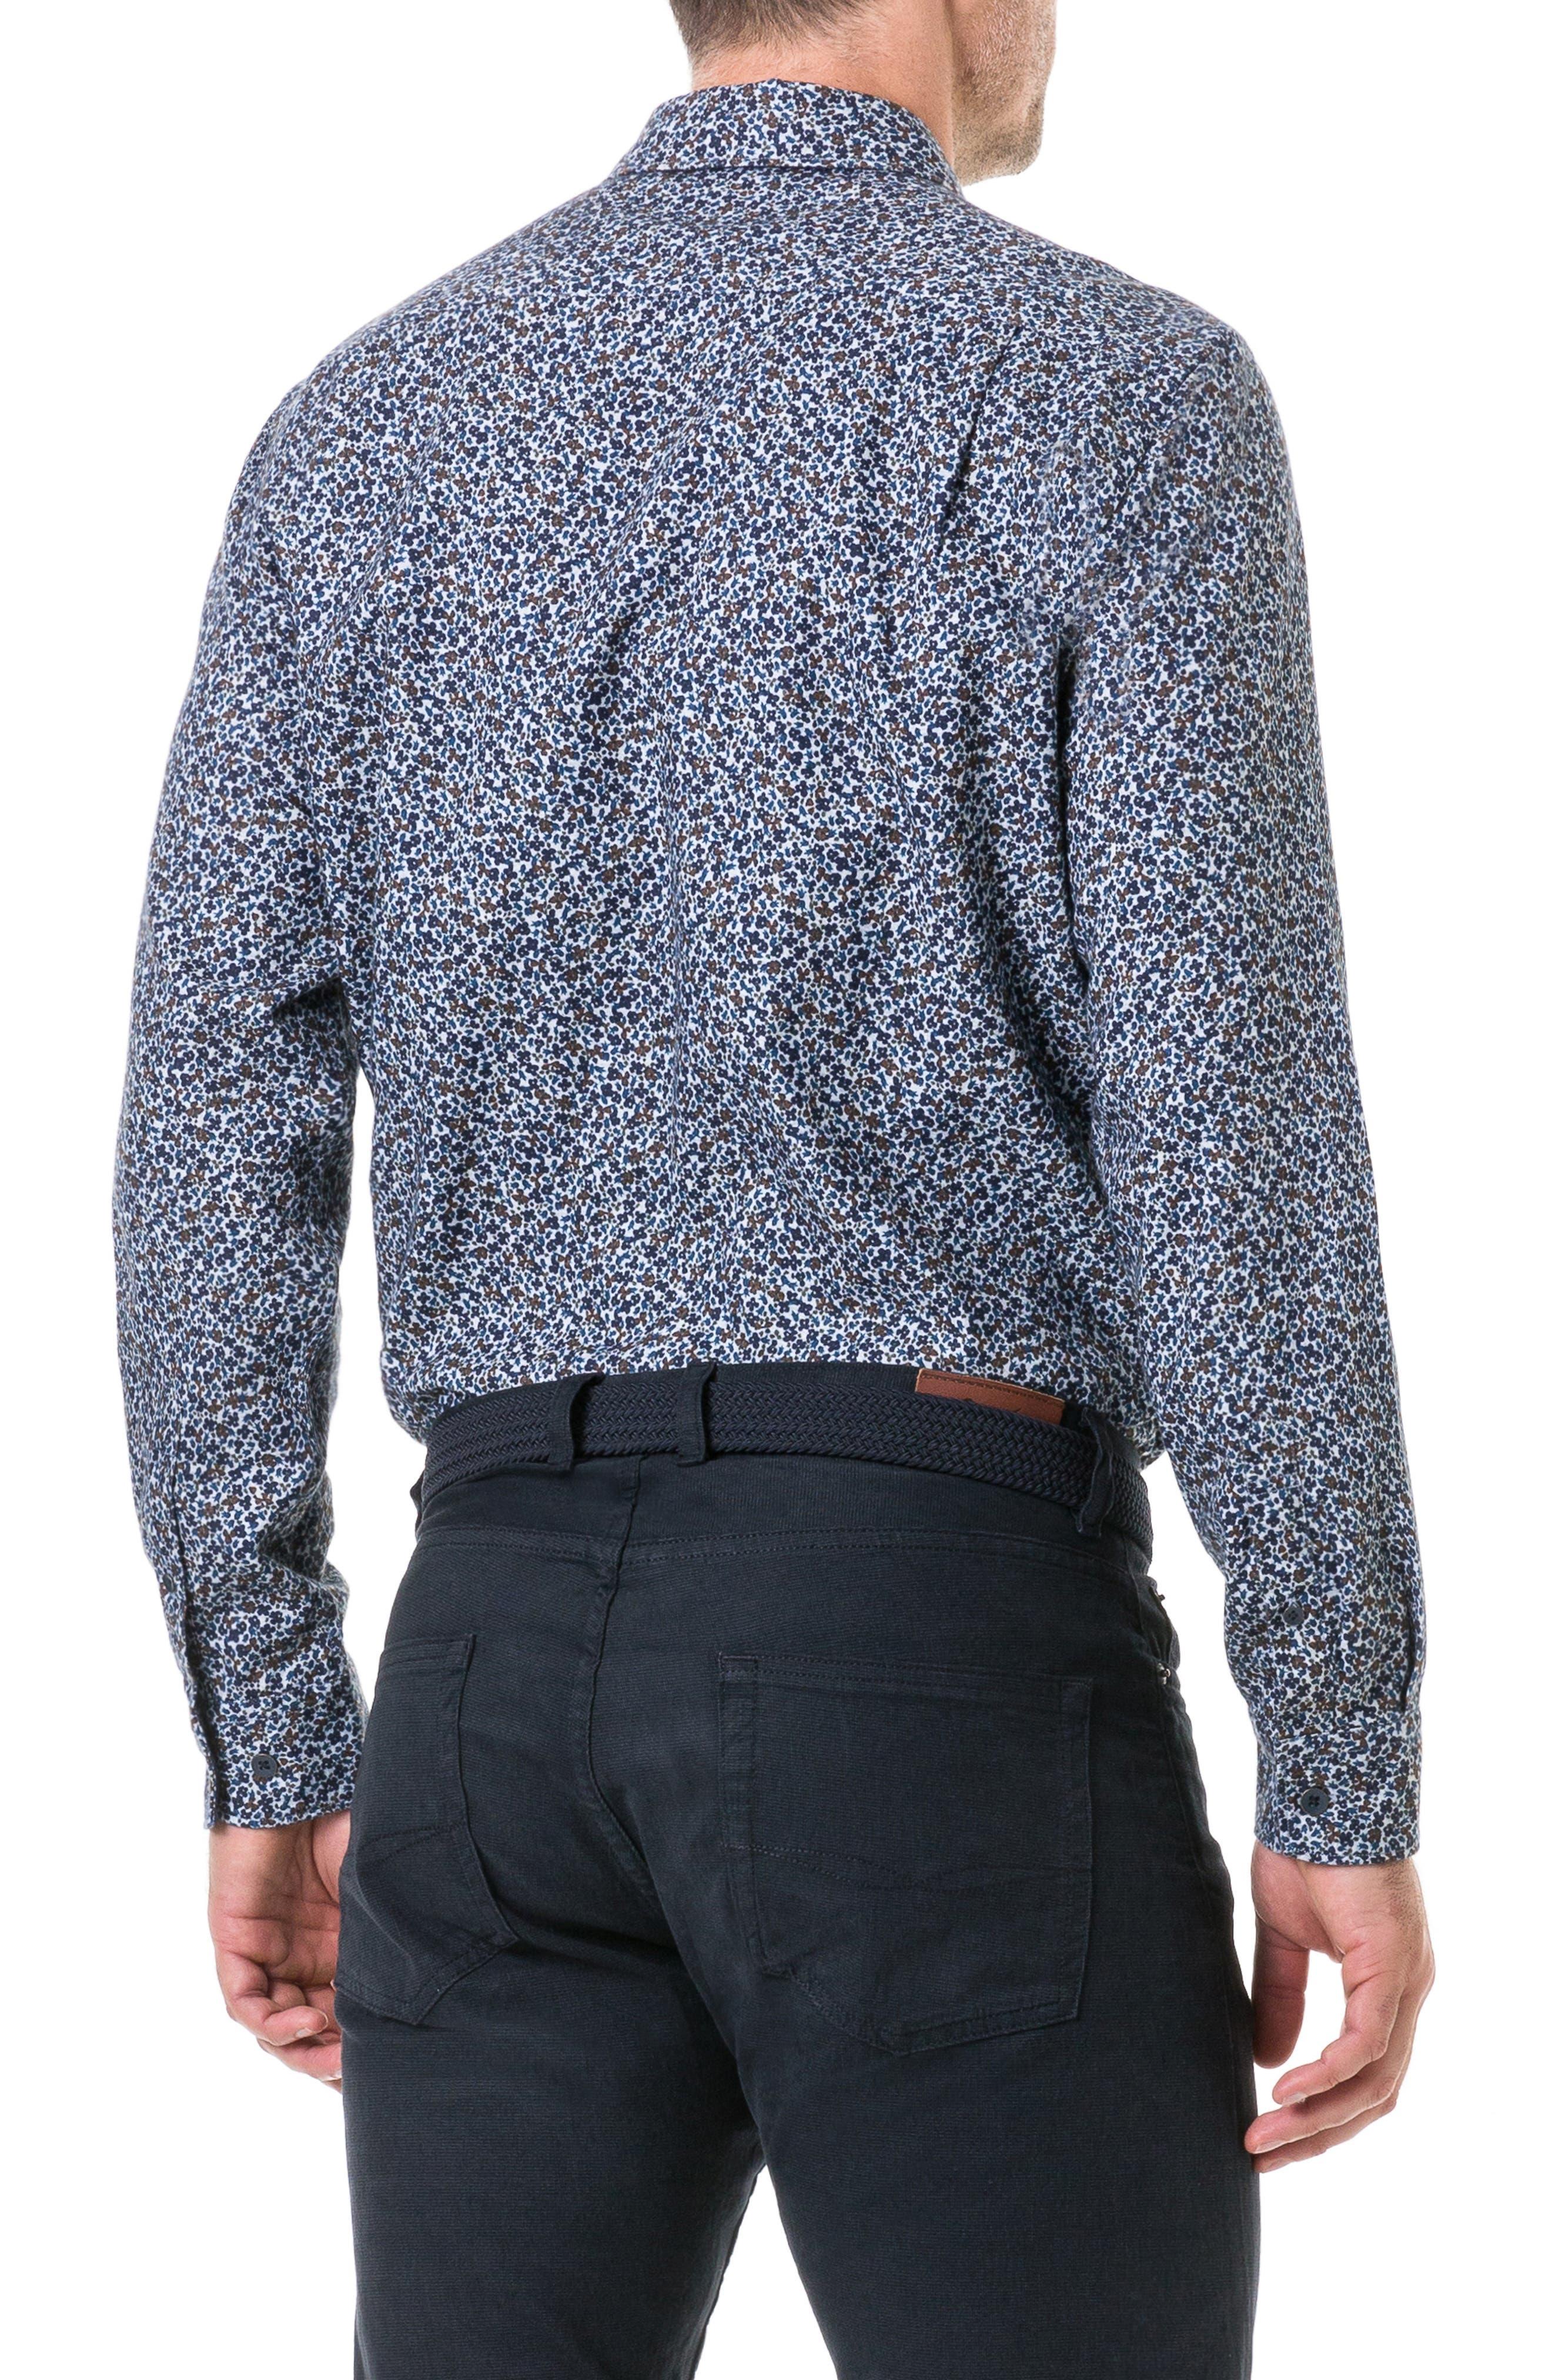 Freys Crescent Regular Fit Flannel Sport Shirt,                             Alternate thumbnail 3, color,                             BLUEBERRY